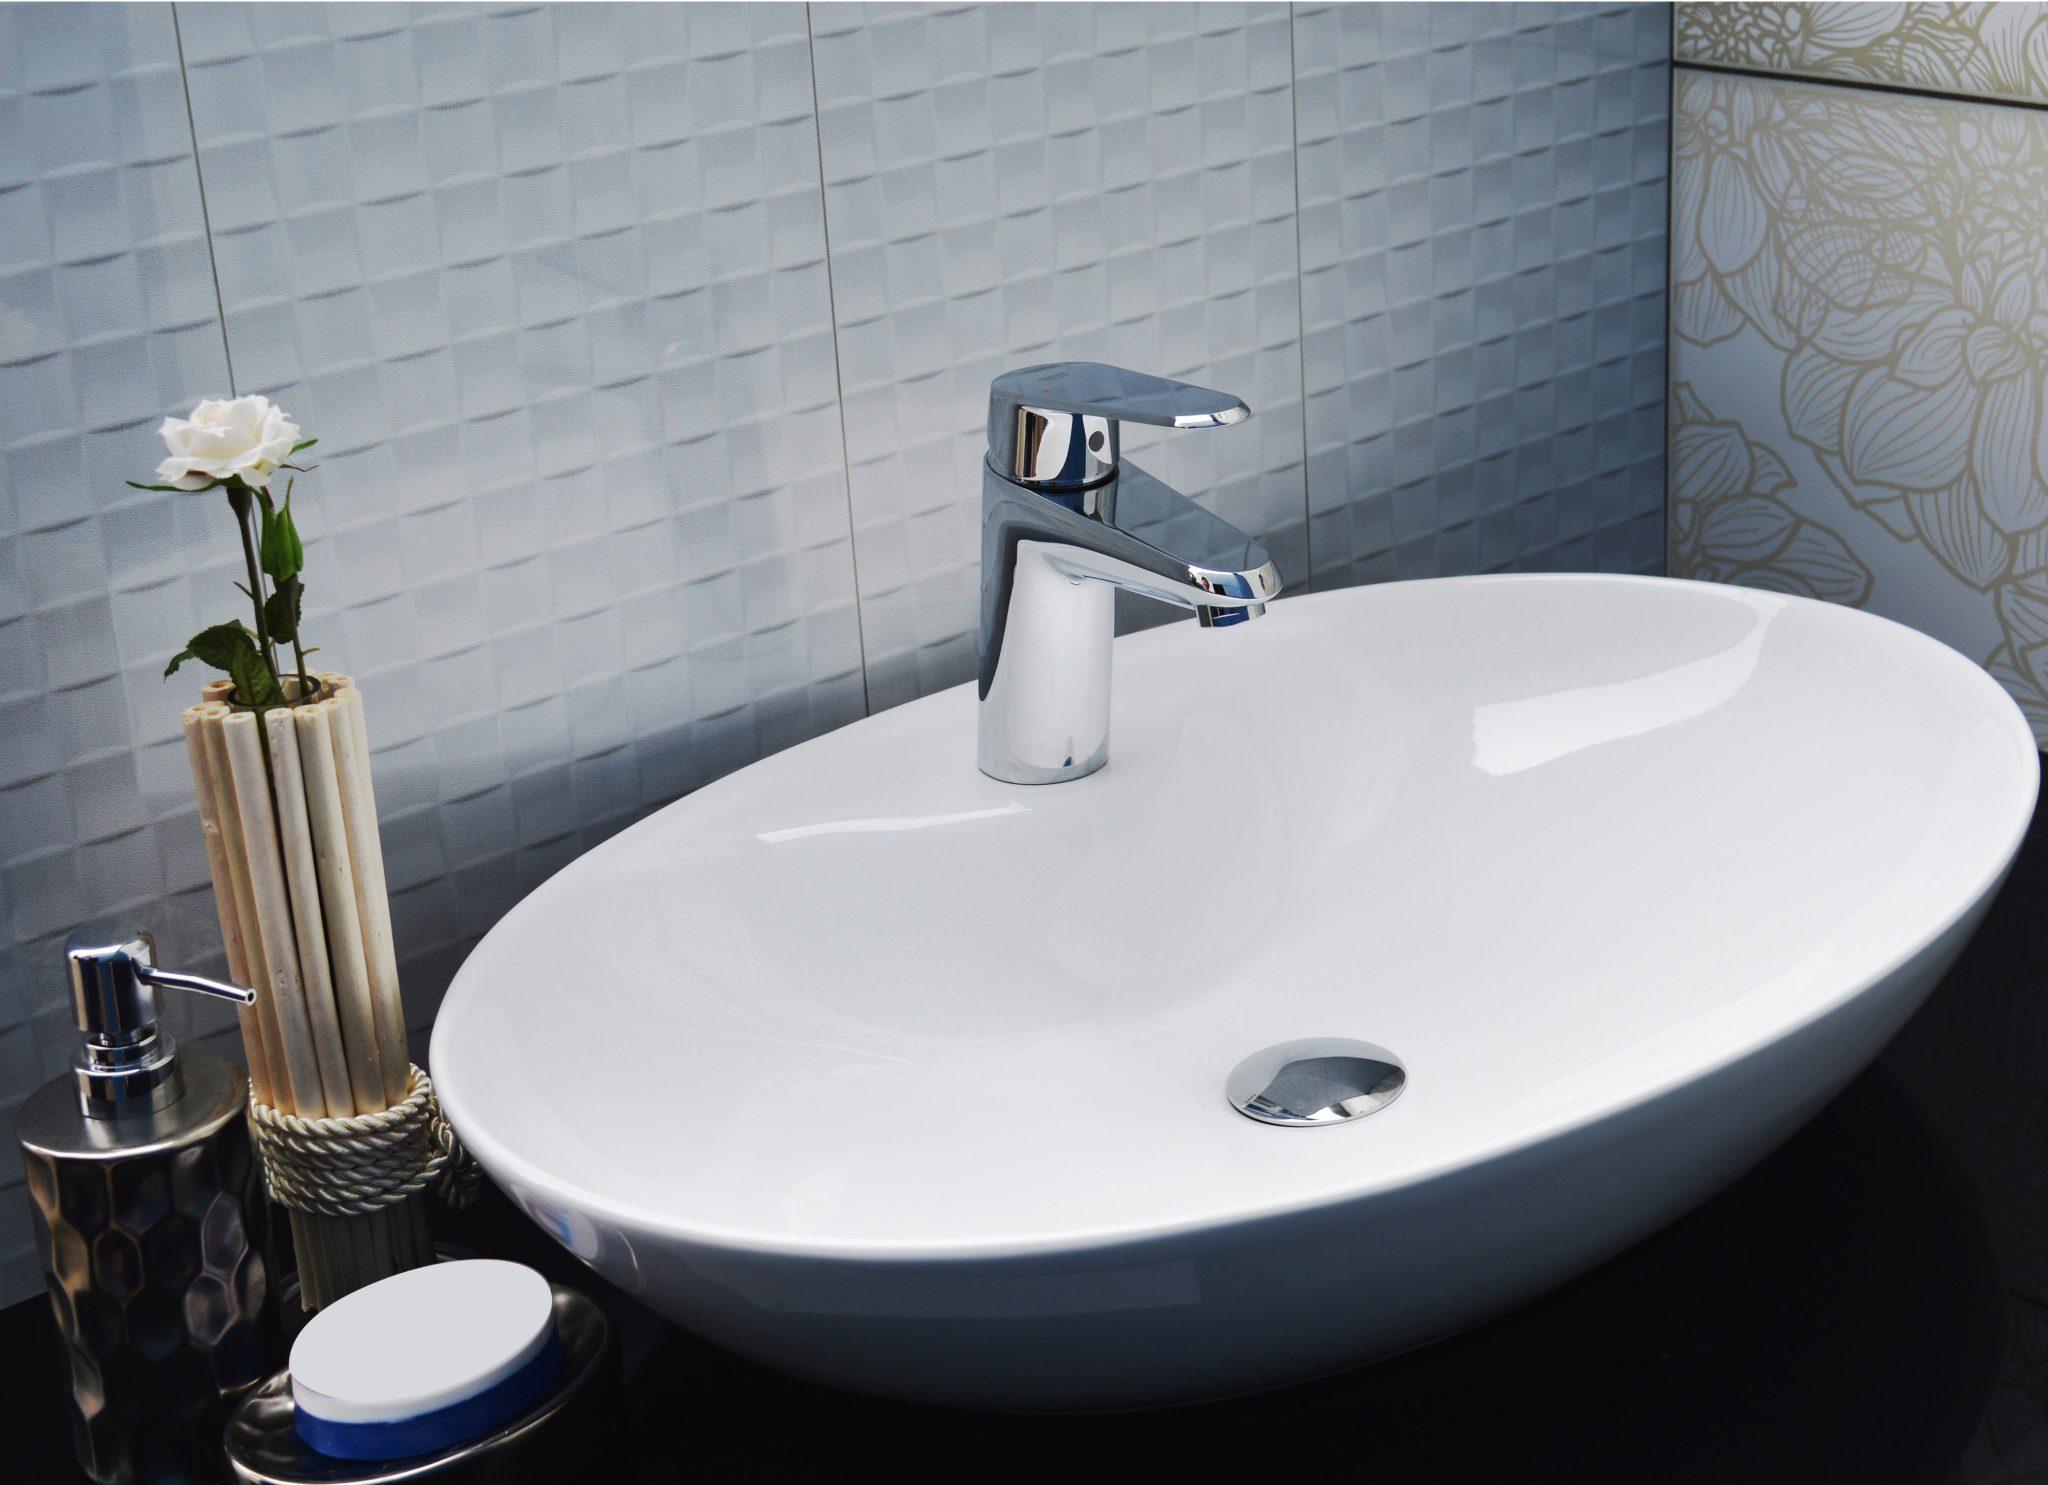 Vasque dans la salle de bain